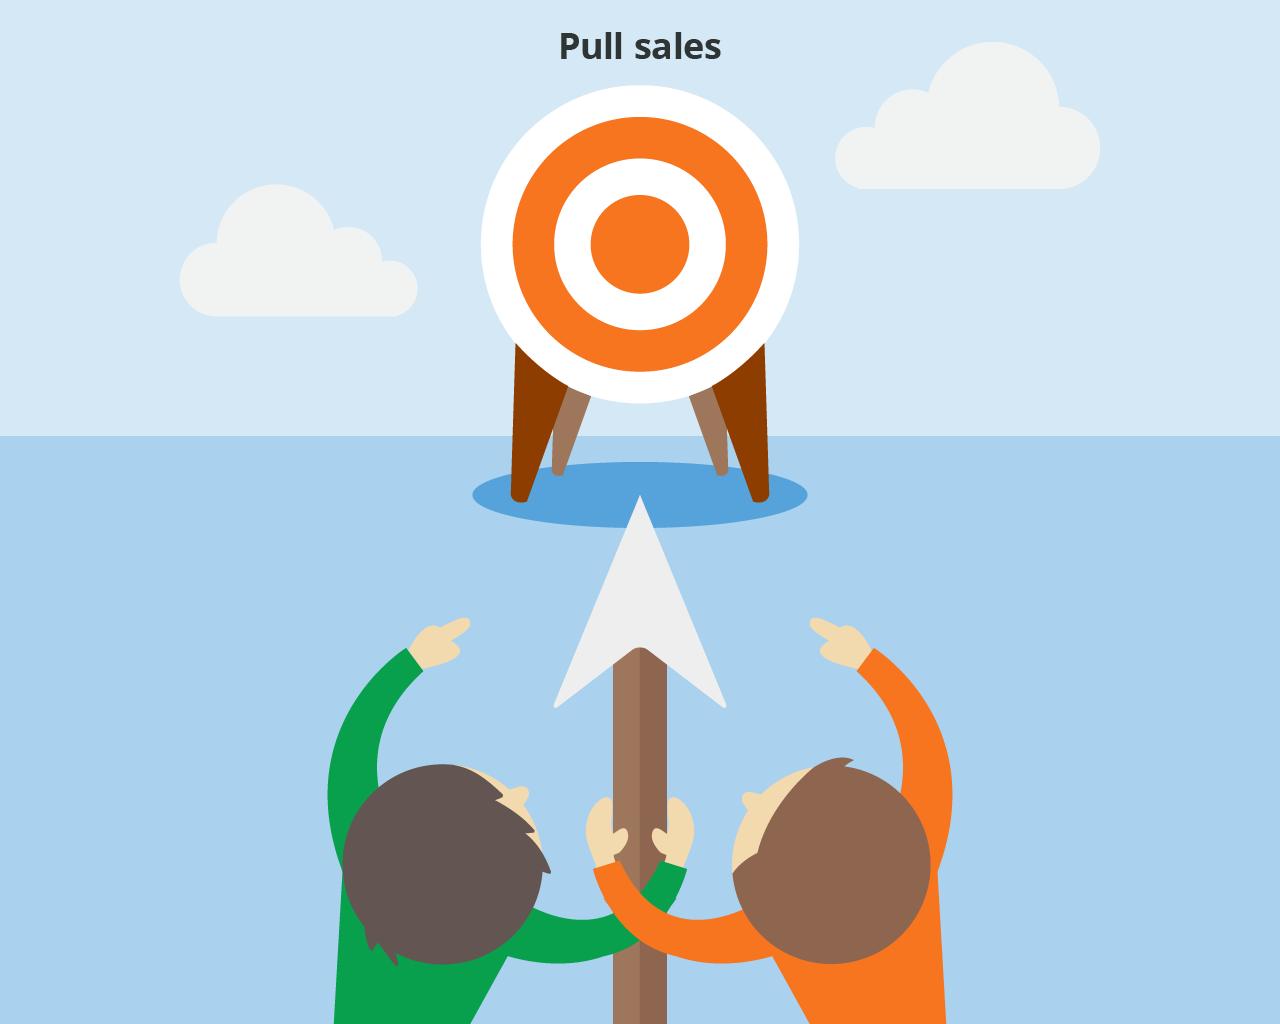 pull_sales_team.png